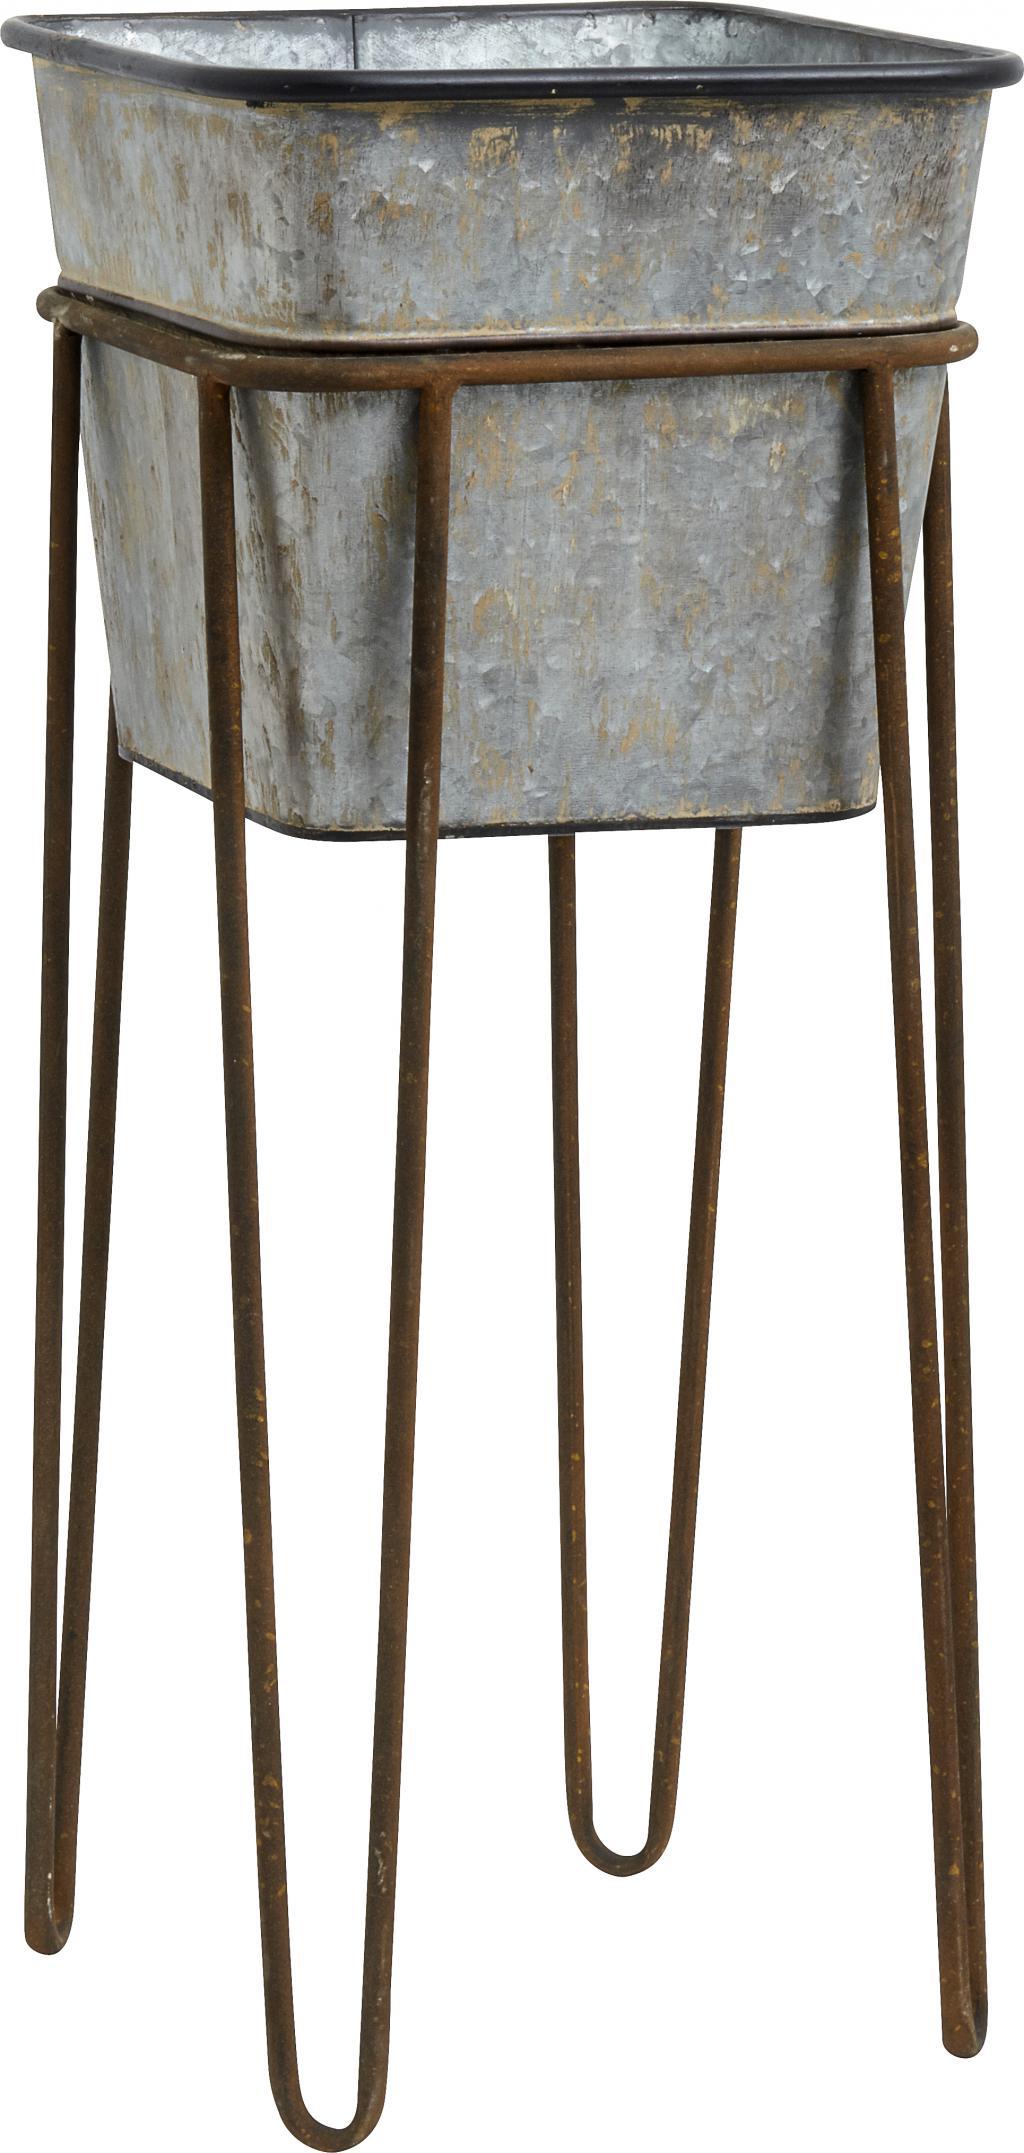 plantenbak---bruin---metaal---l---nordal[0].jpg